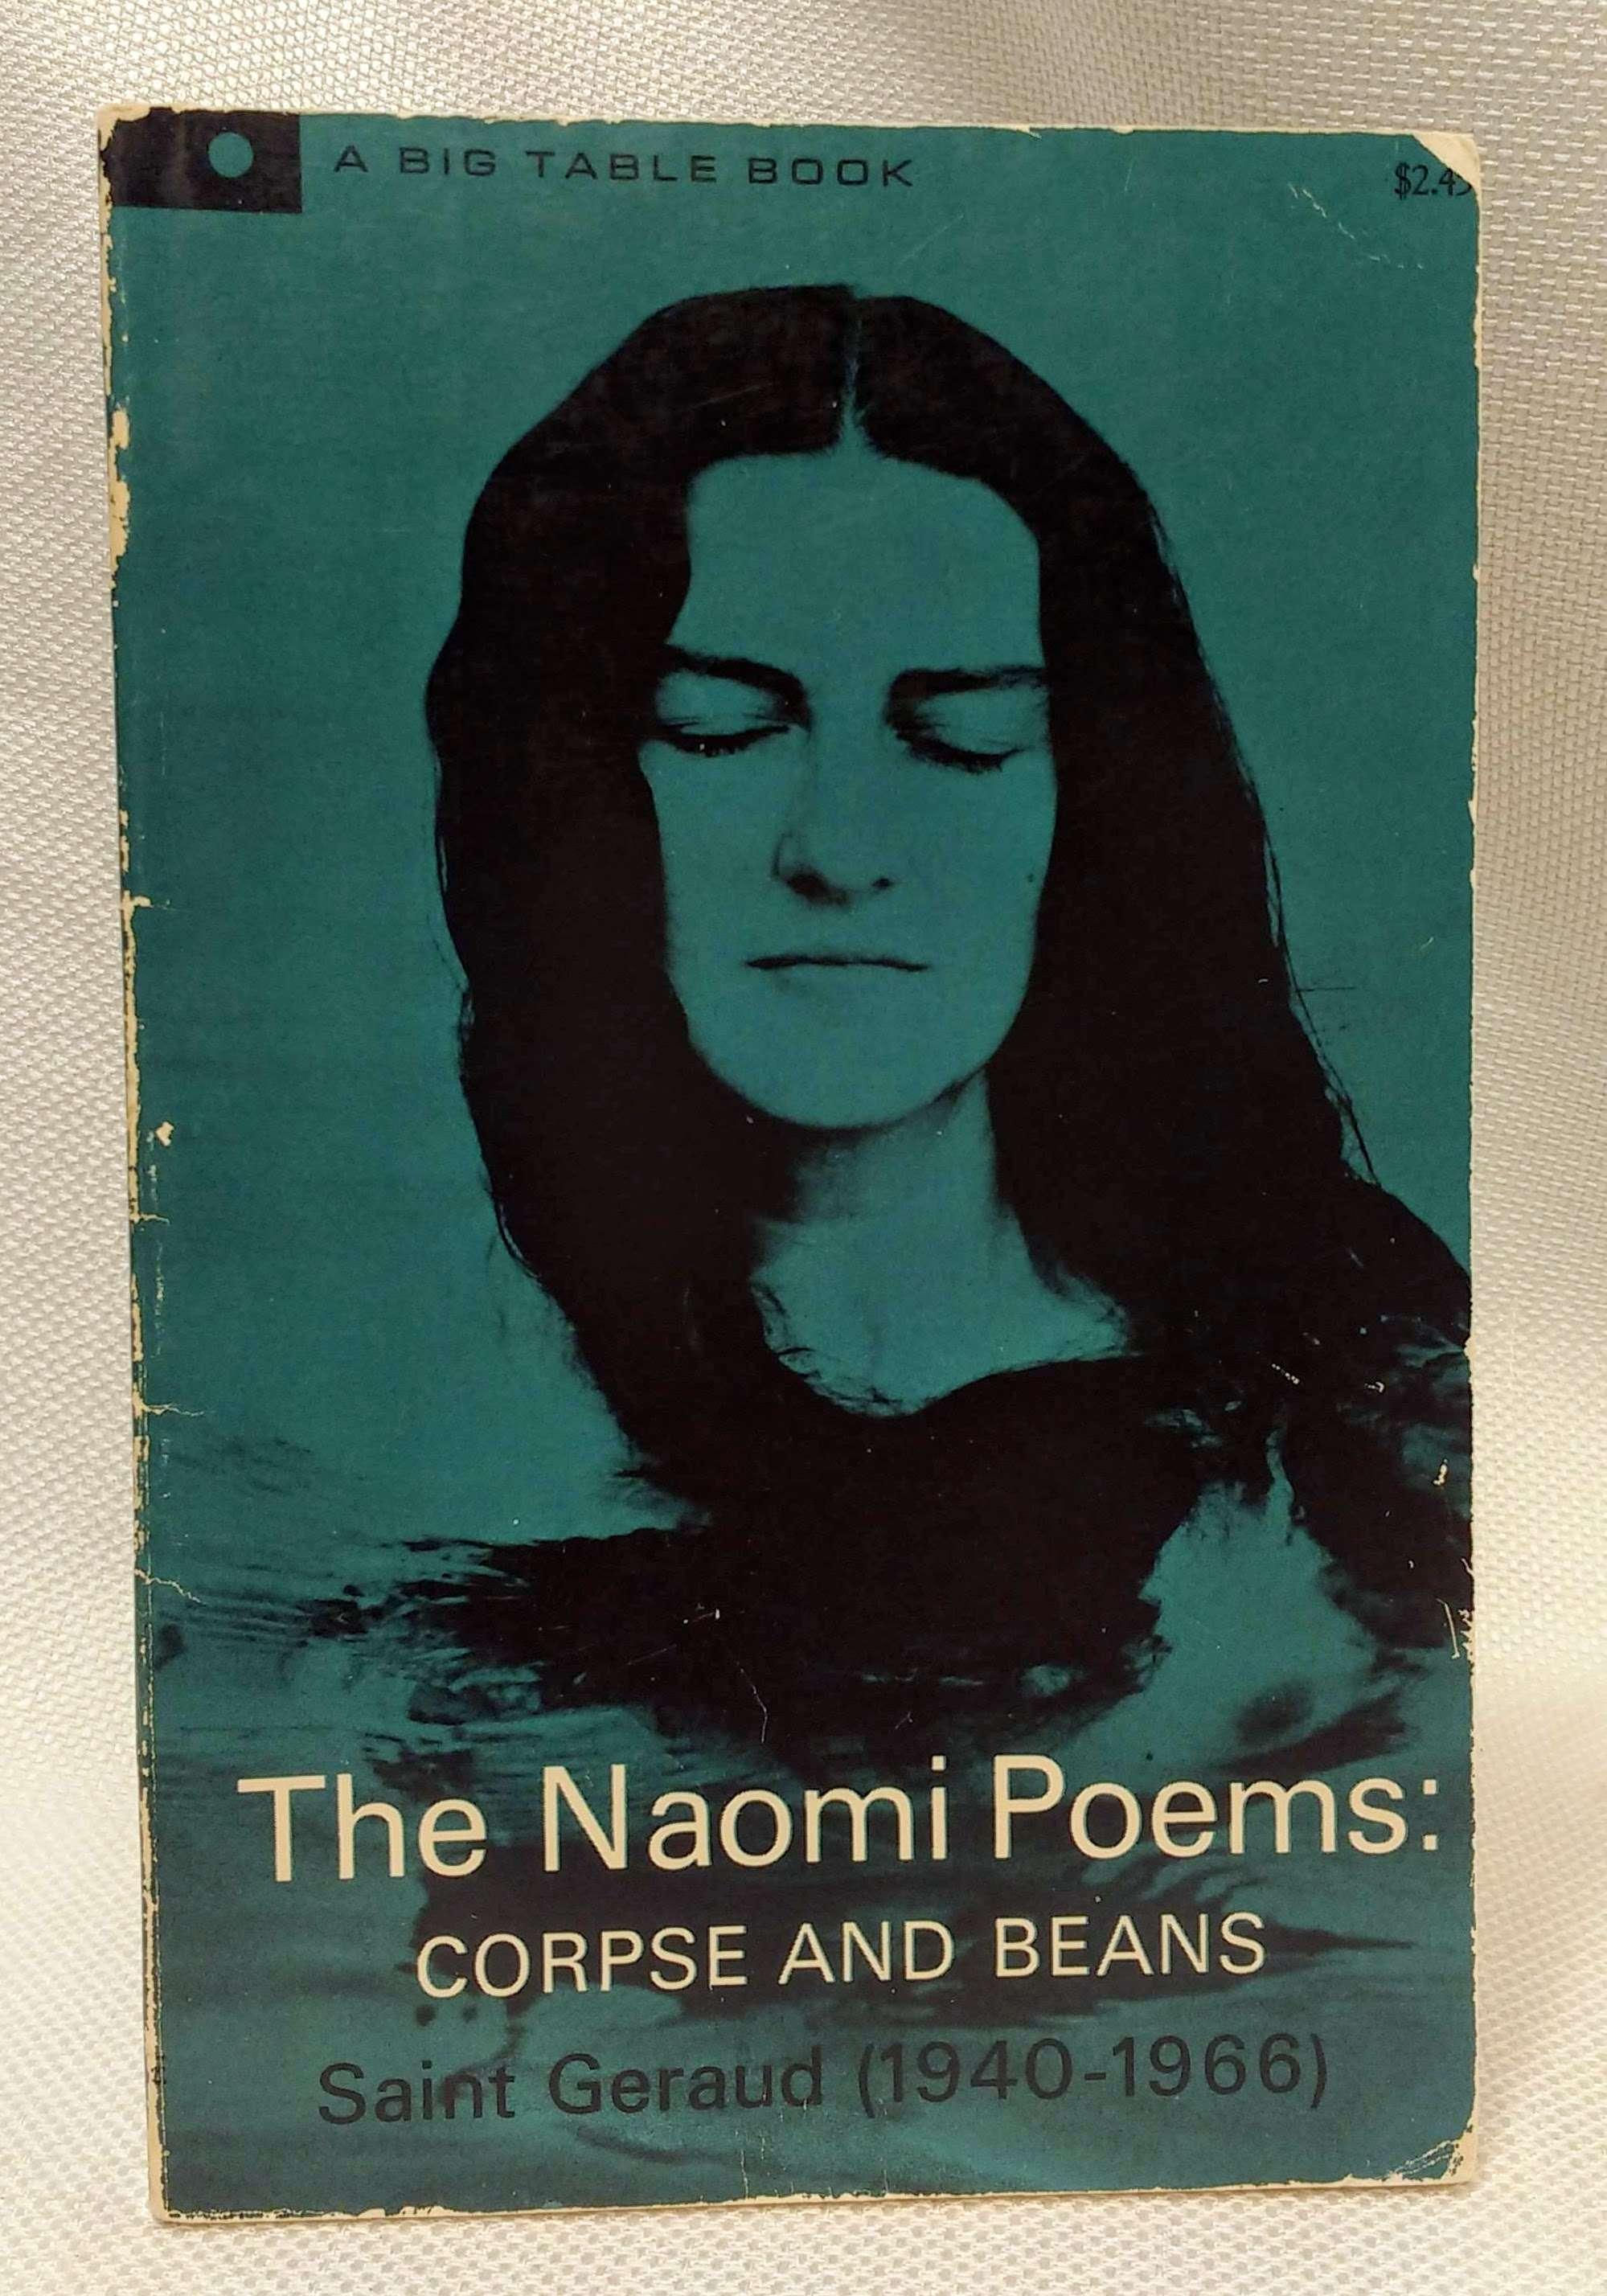 The Naomi Poems: Corpse and Beans, William Knott (Saint Geraud)